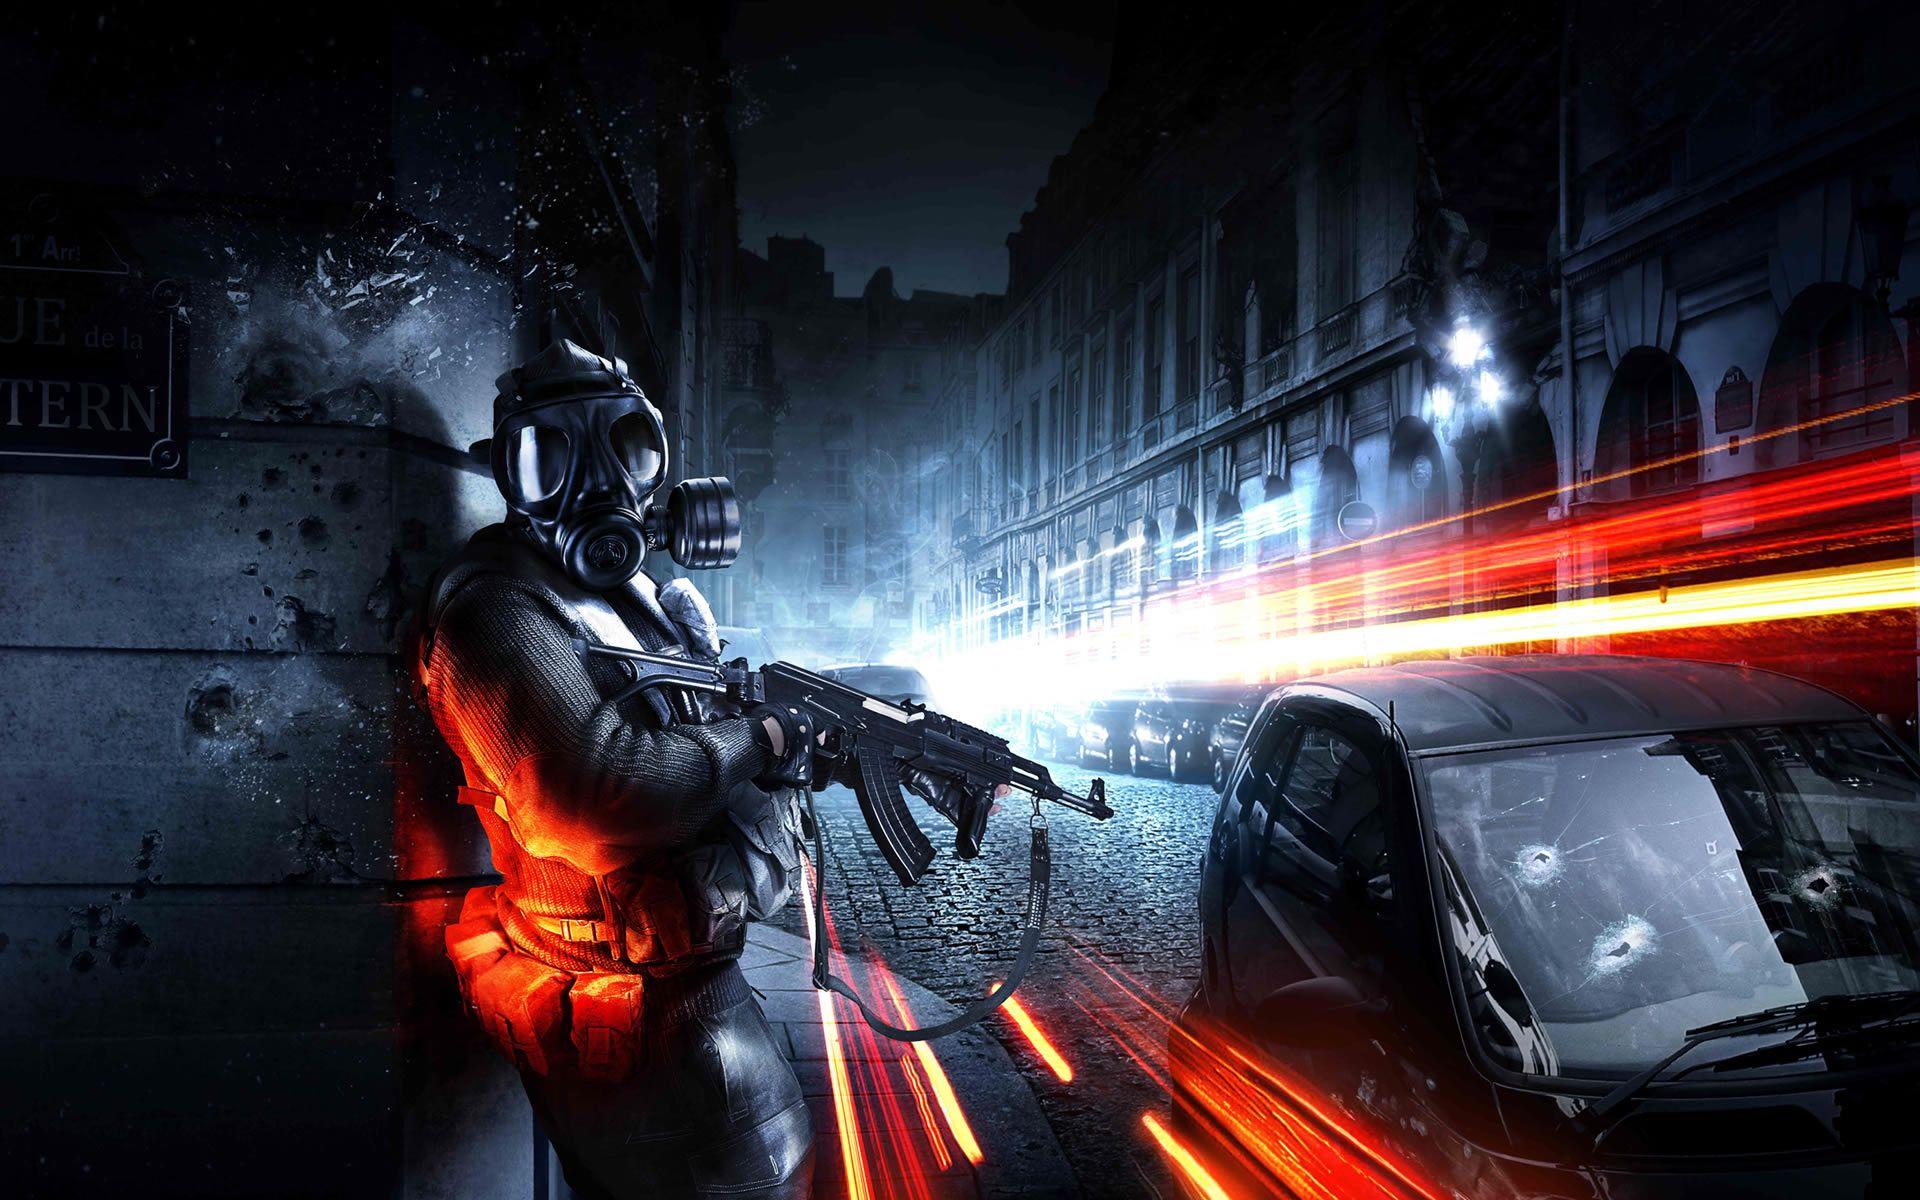 Battlefield 3 Wallpapers, Images, Wallpapers of Battlefield 3 in ...